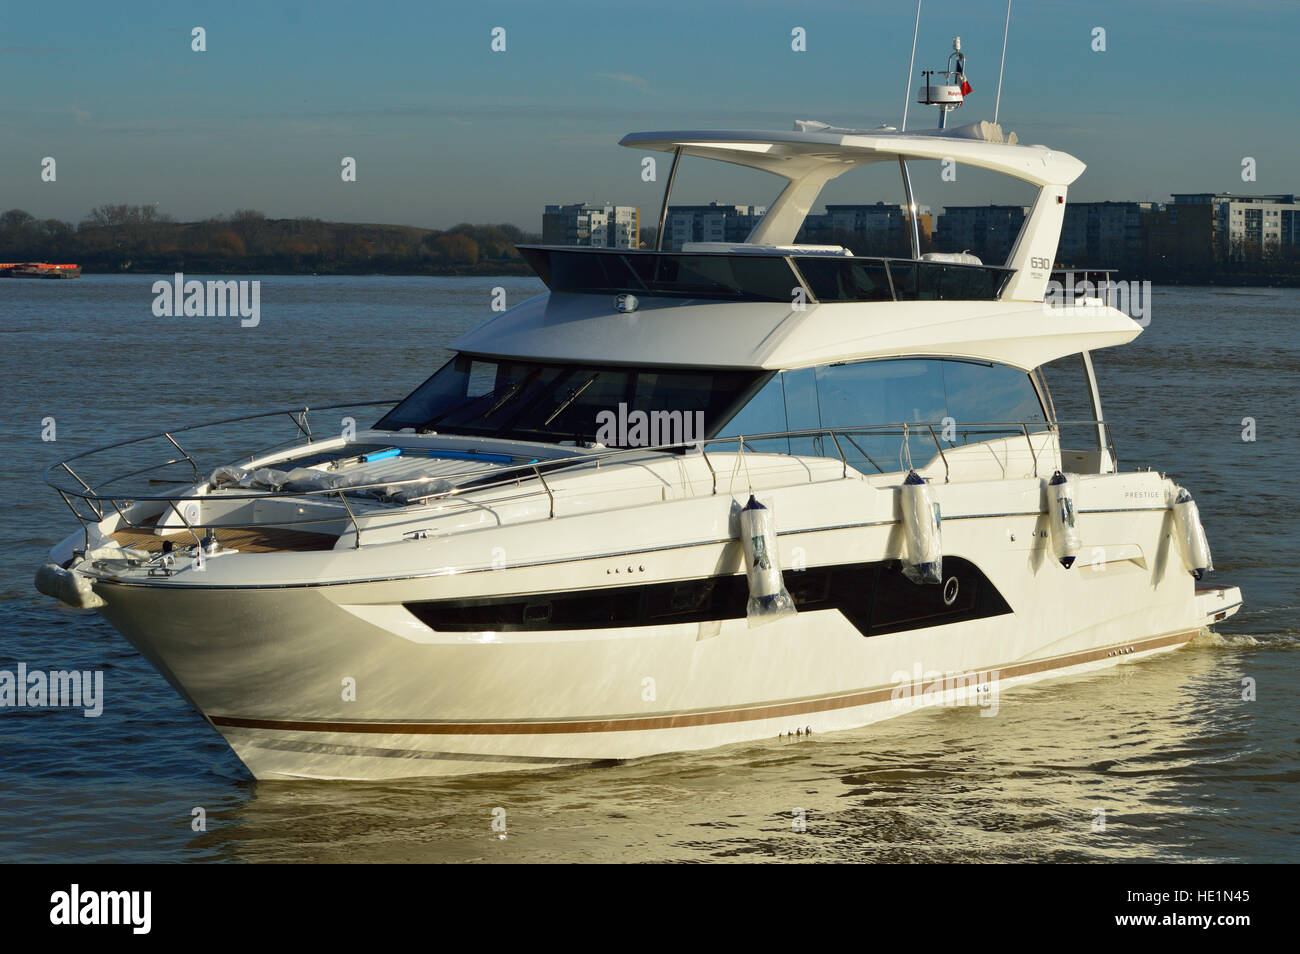 Prestige 630 luxury yacht heading to London Boat Show 2017 - Stock Image